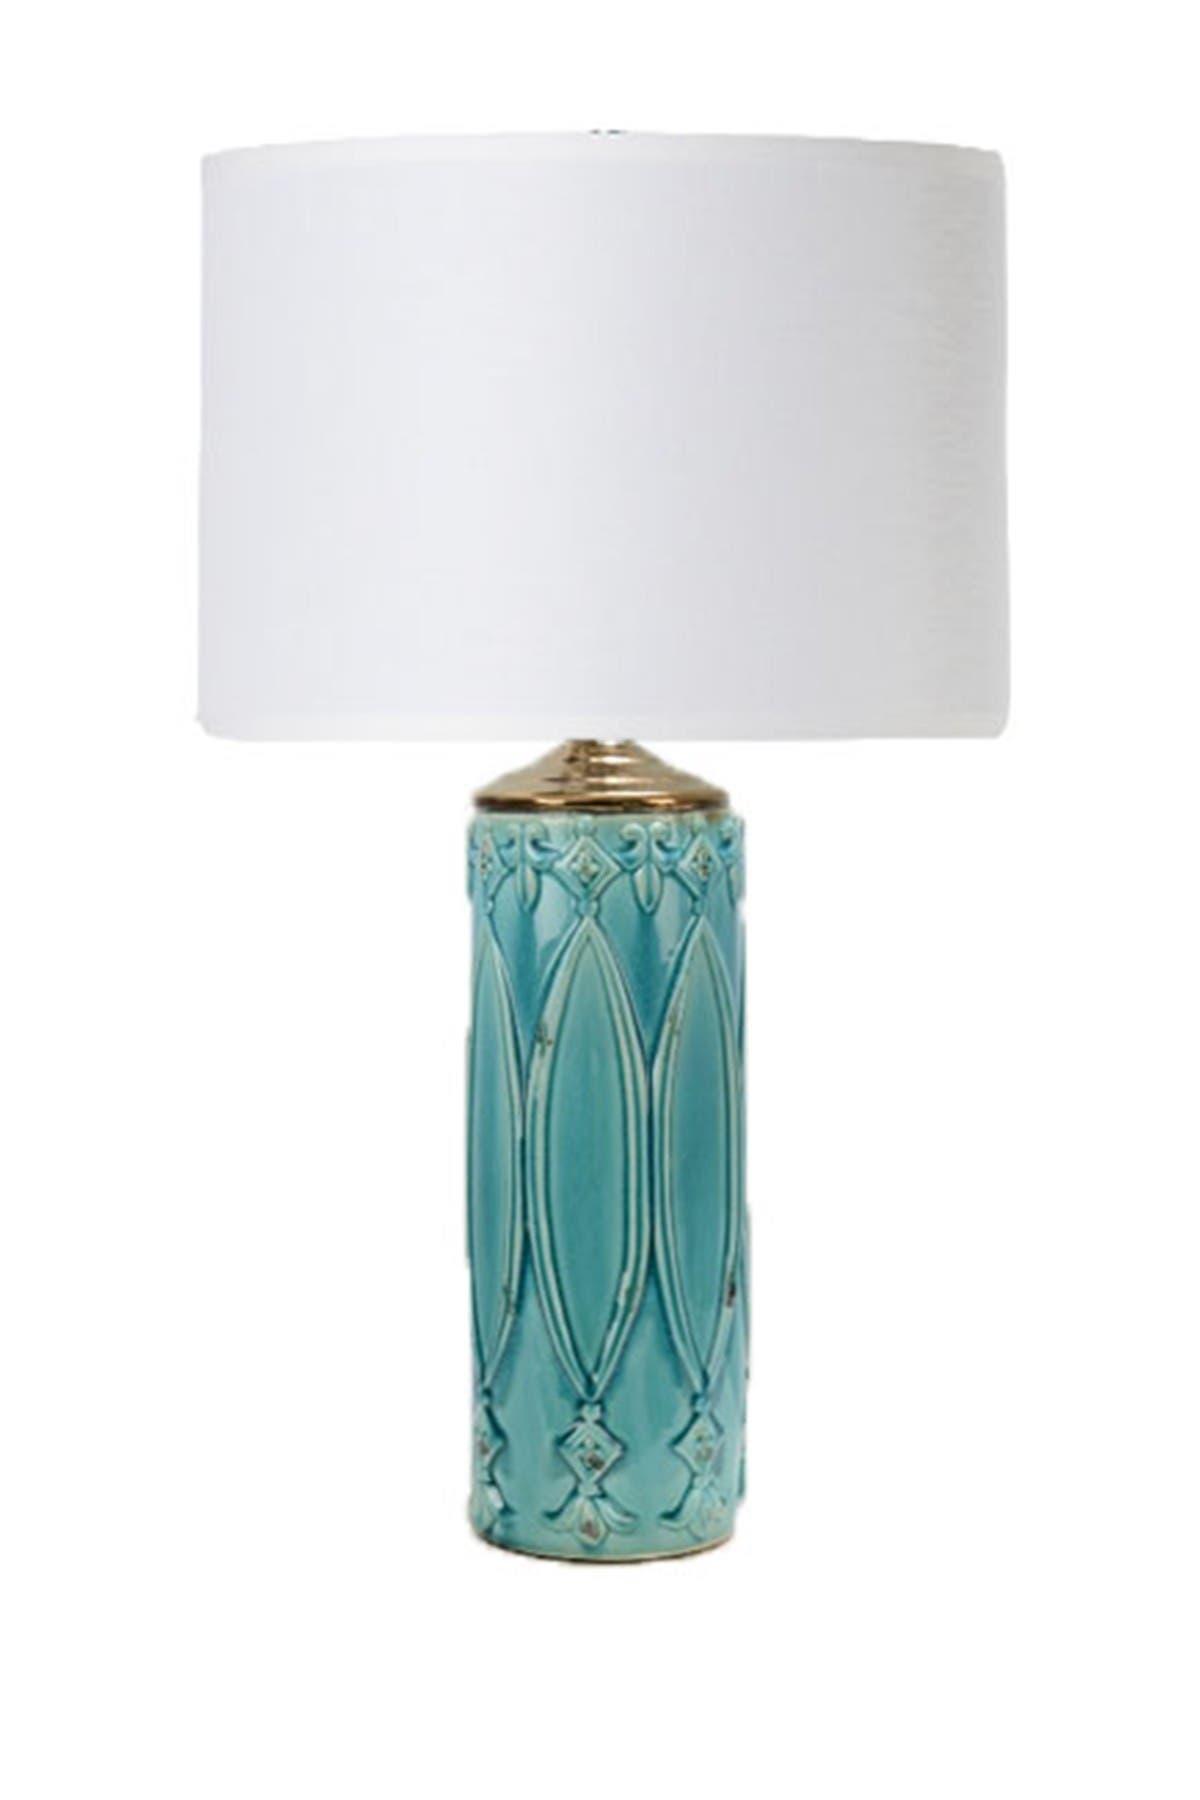 Image of Shine Studio Tabitha Ceramic Table Lamp